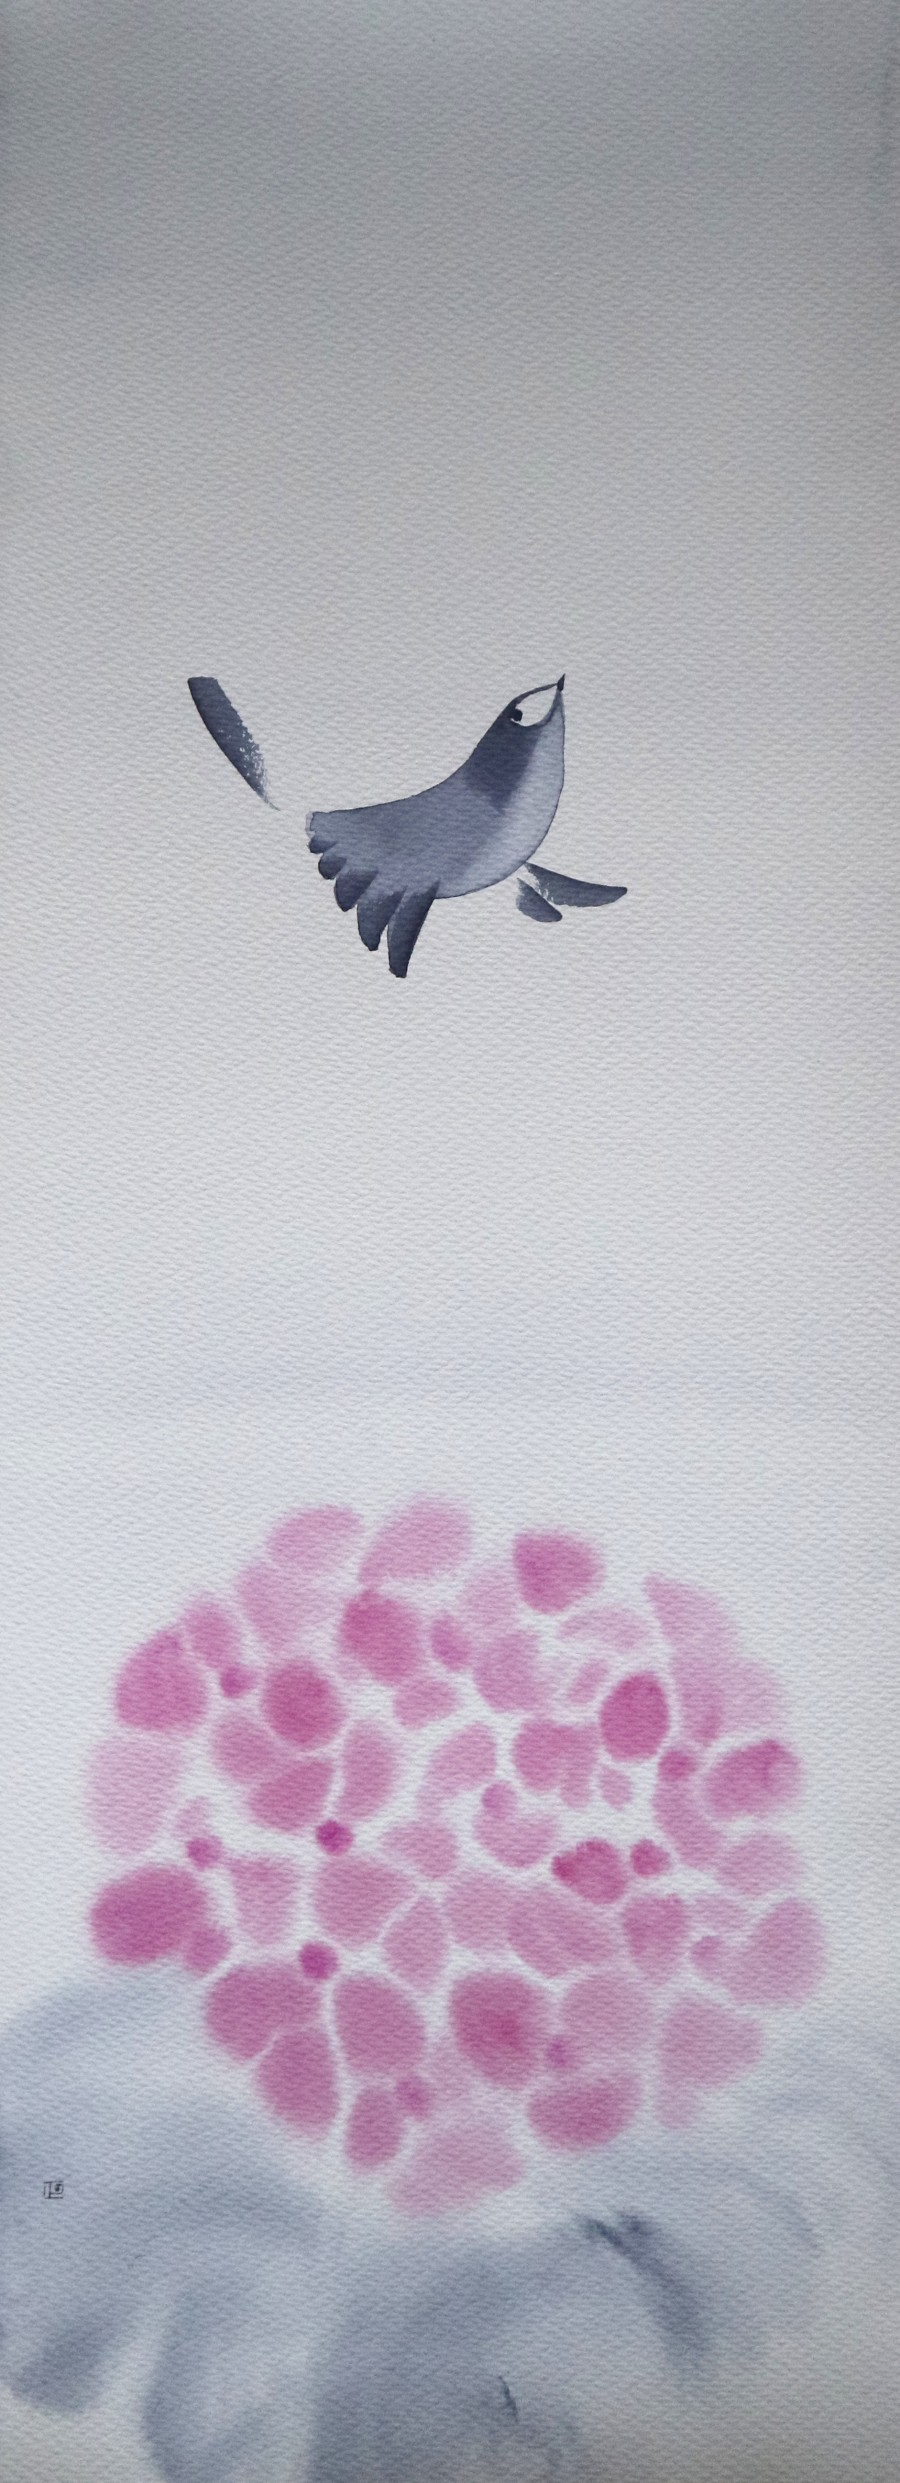 Hydrangeas-Carefree